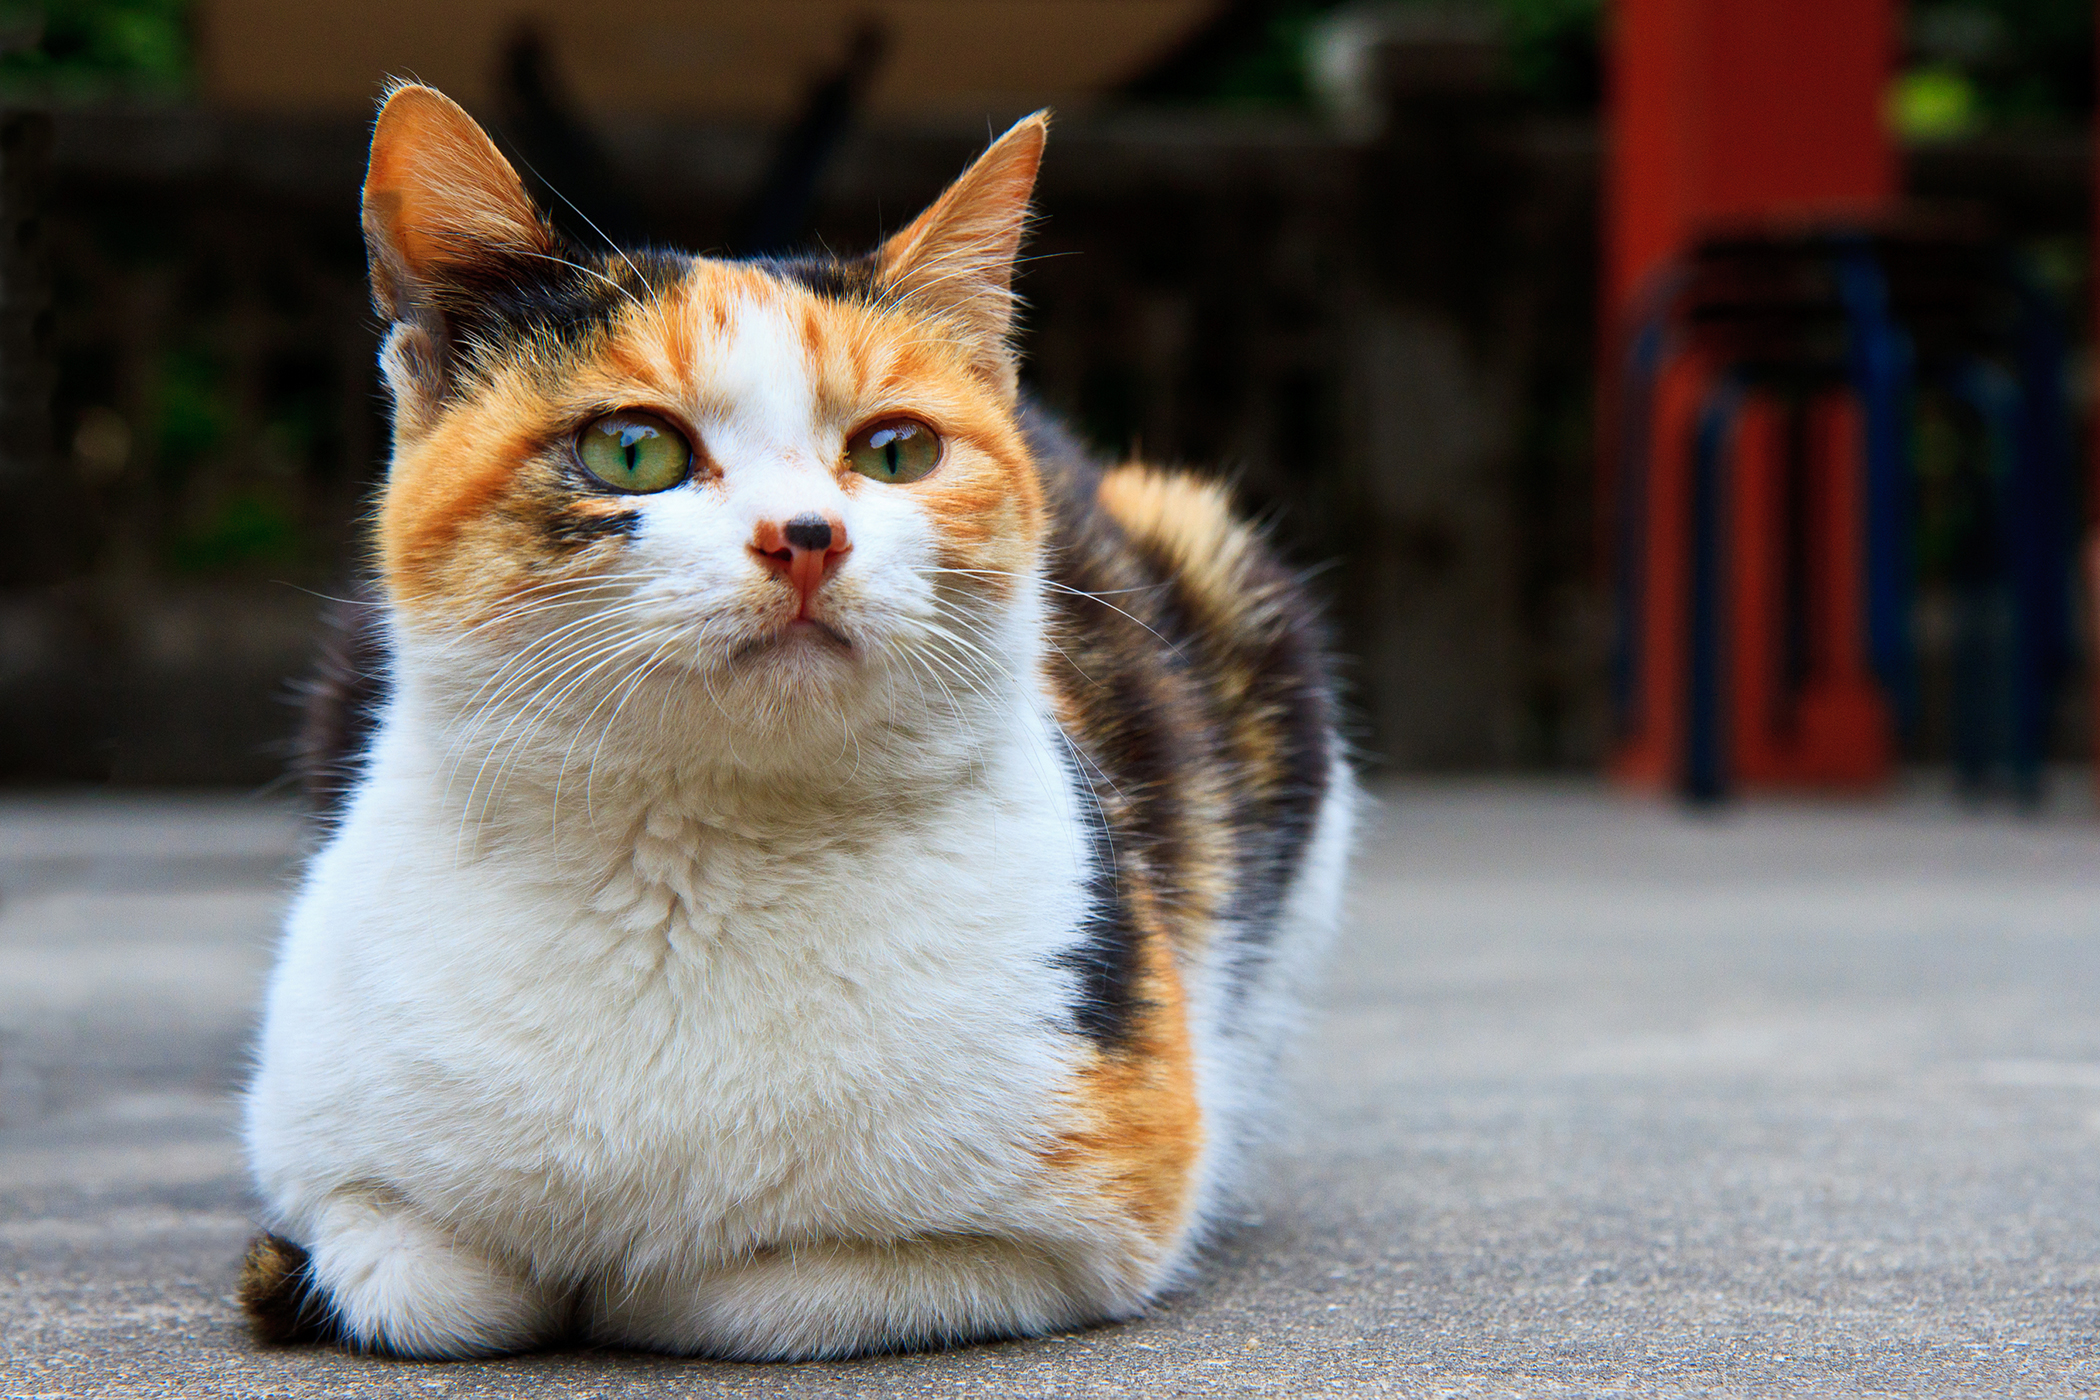 Uterine Prolapse in Cats